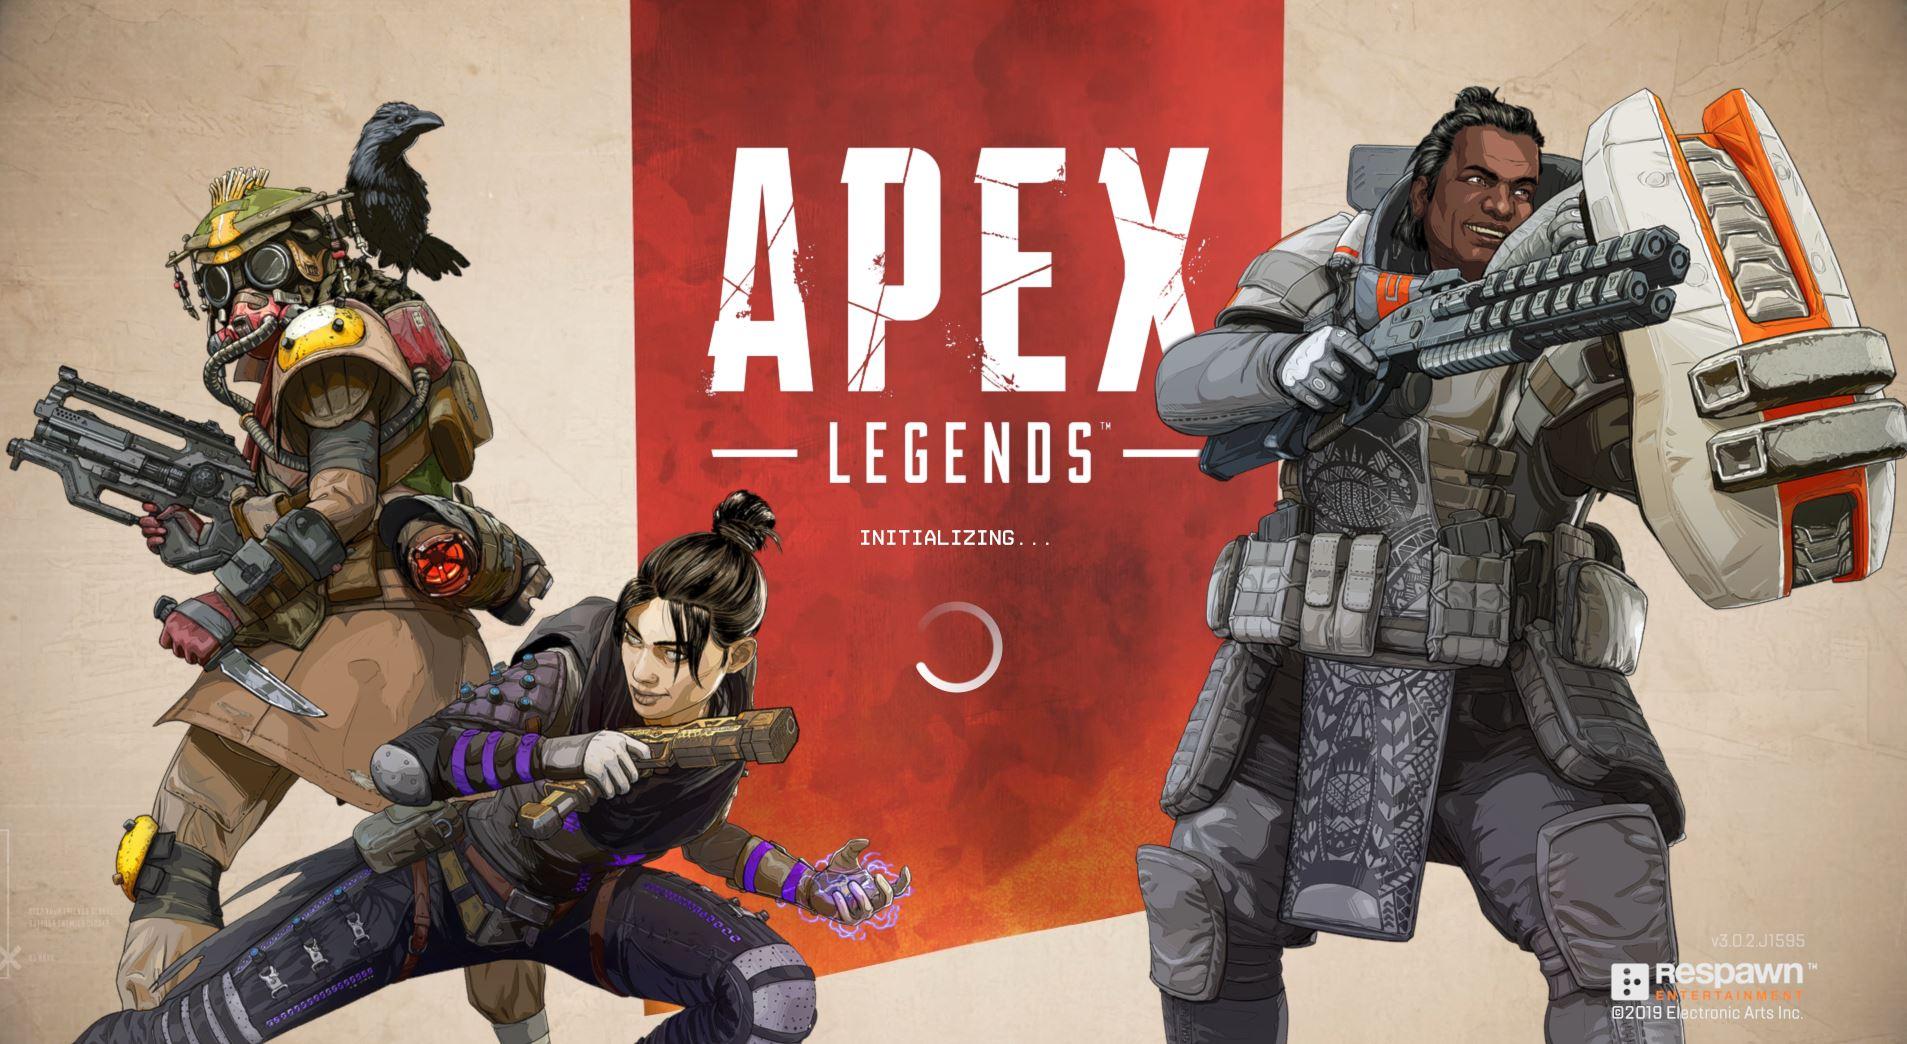 How to Fix Apex Legends Stucks on Loading Screen